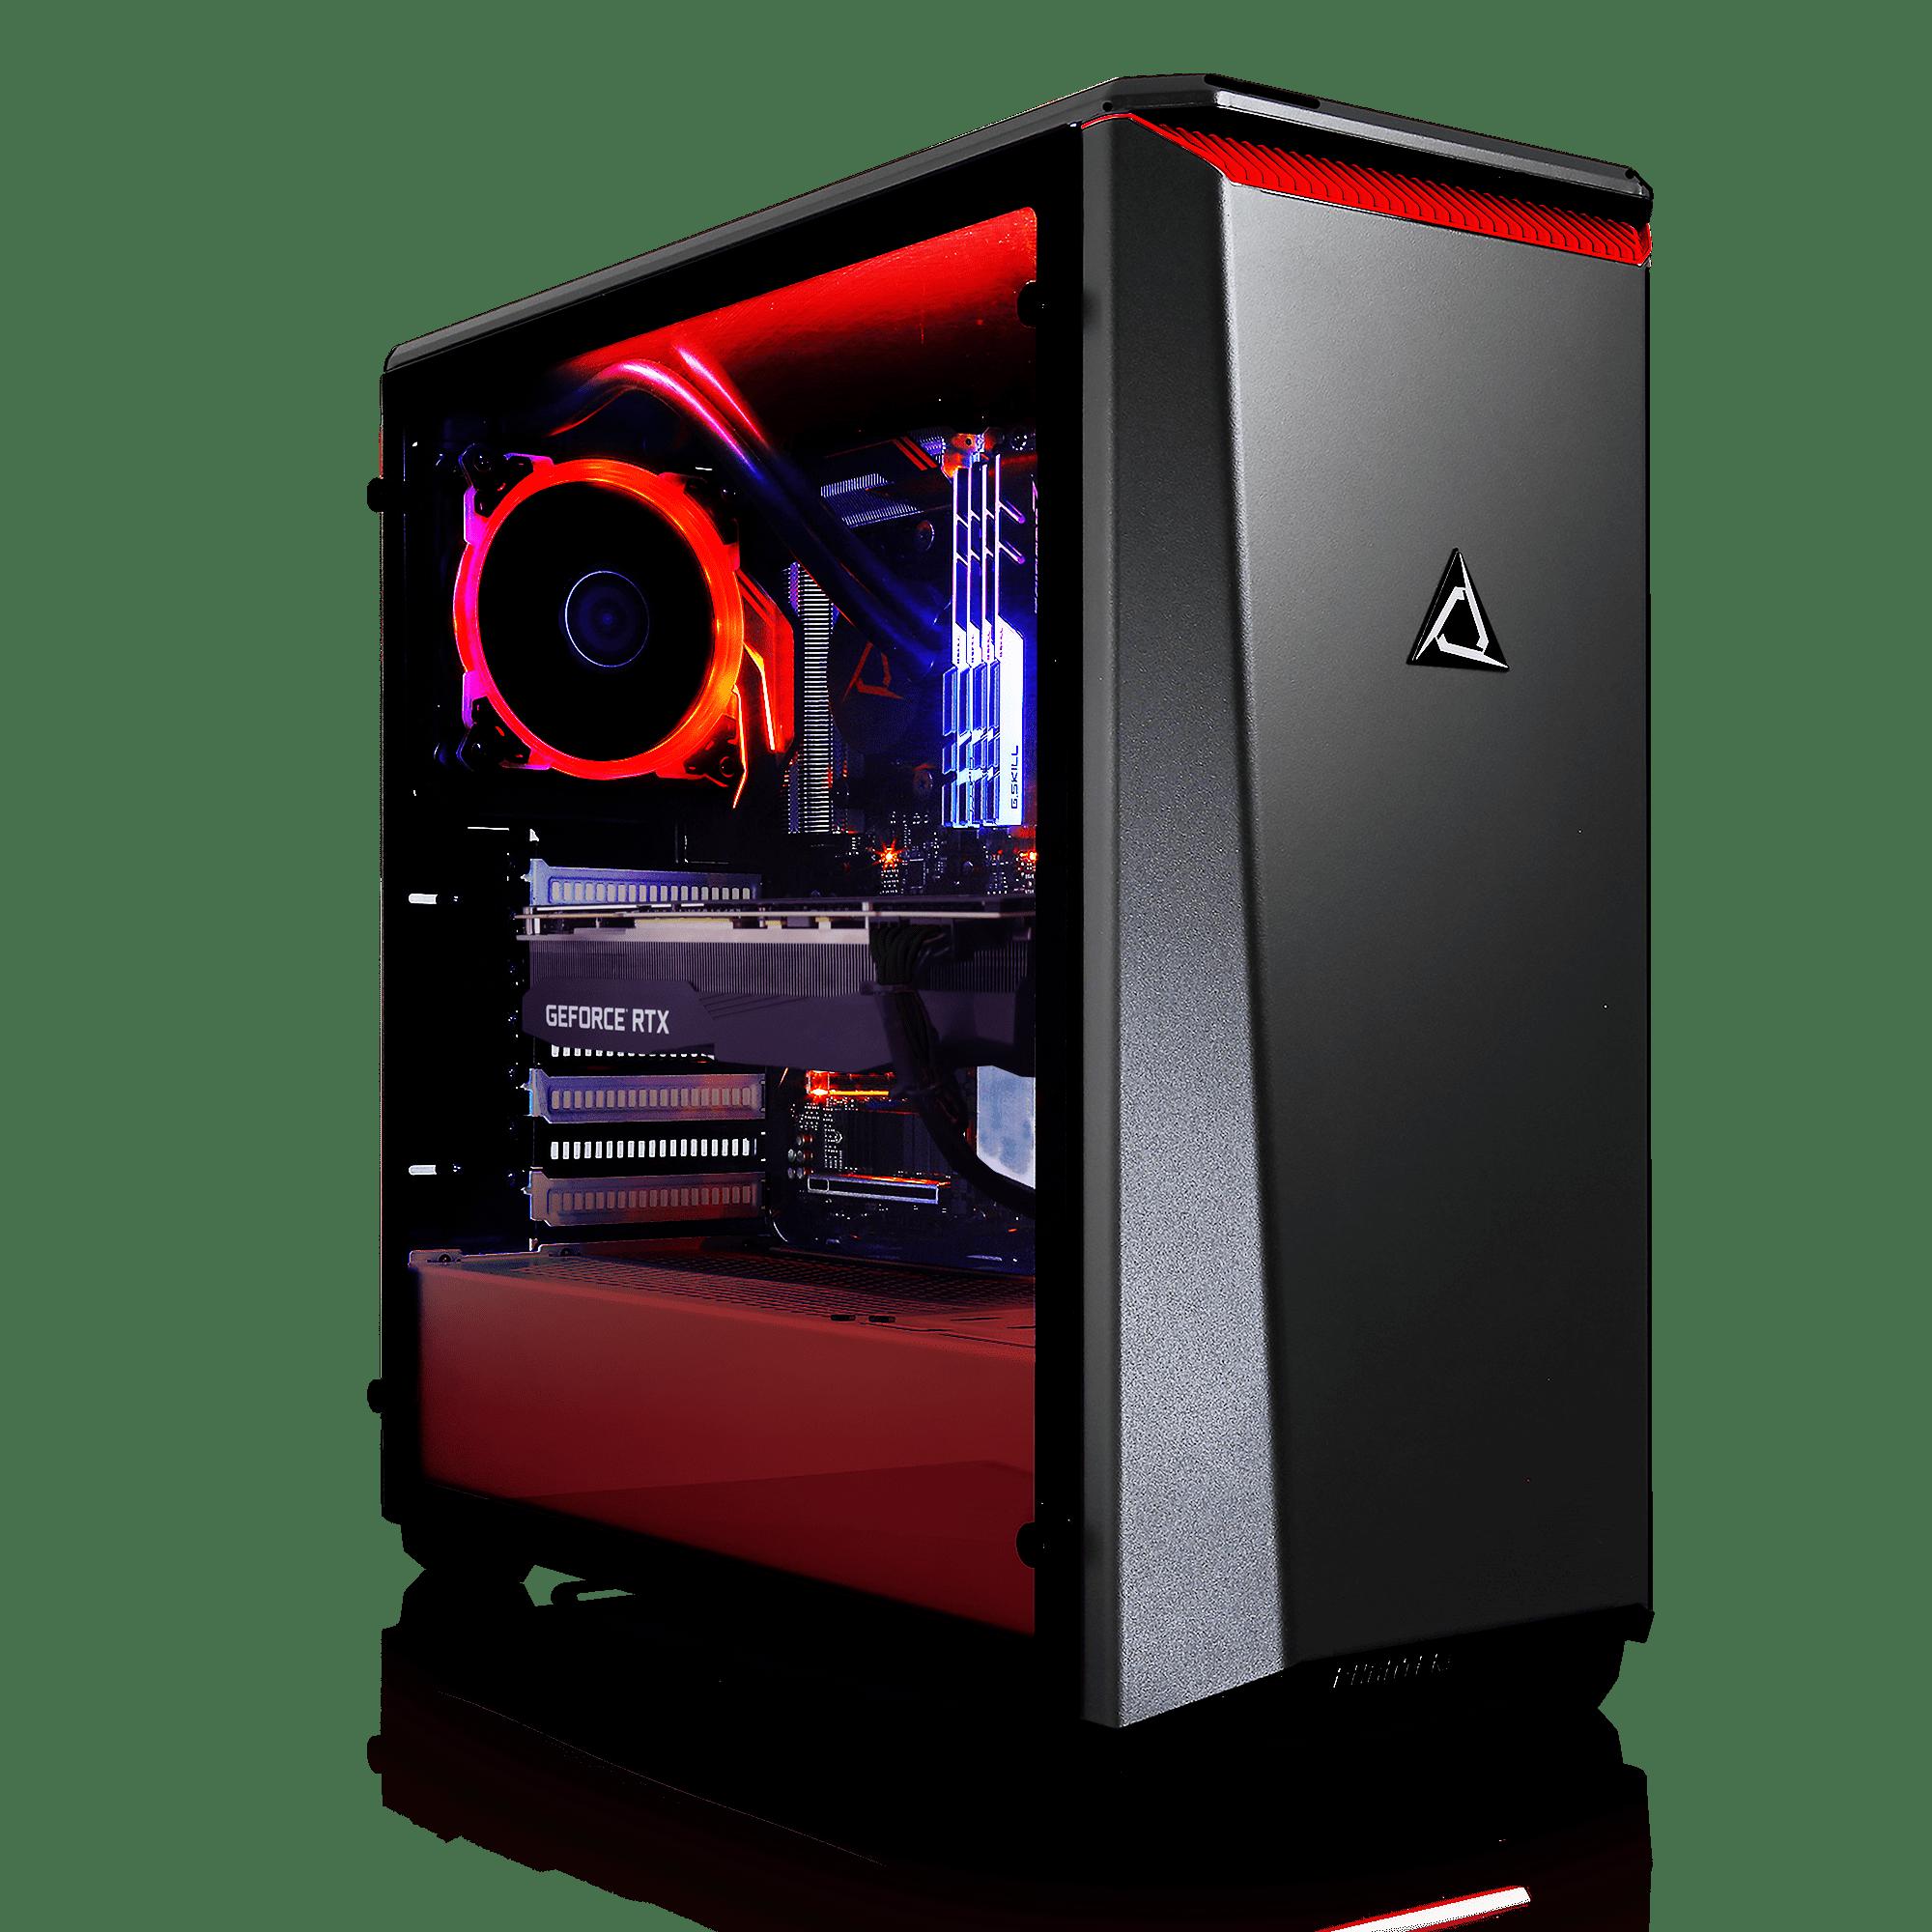 CLX SET GAMING PC AMD Ryzen Threadripper 2950X 3.50GHz (16 Cores) 32GB DDR4 3TB HDD & 960GB SSD NVIDIA GeForce RTX 2080Ti 11GB GDDR6 MS Windows 10 Home 64-Bit